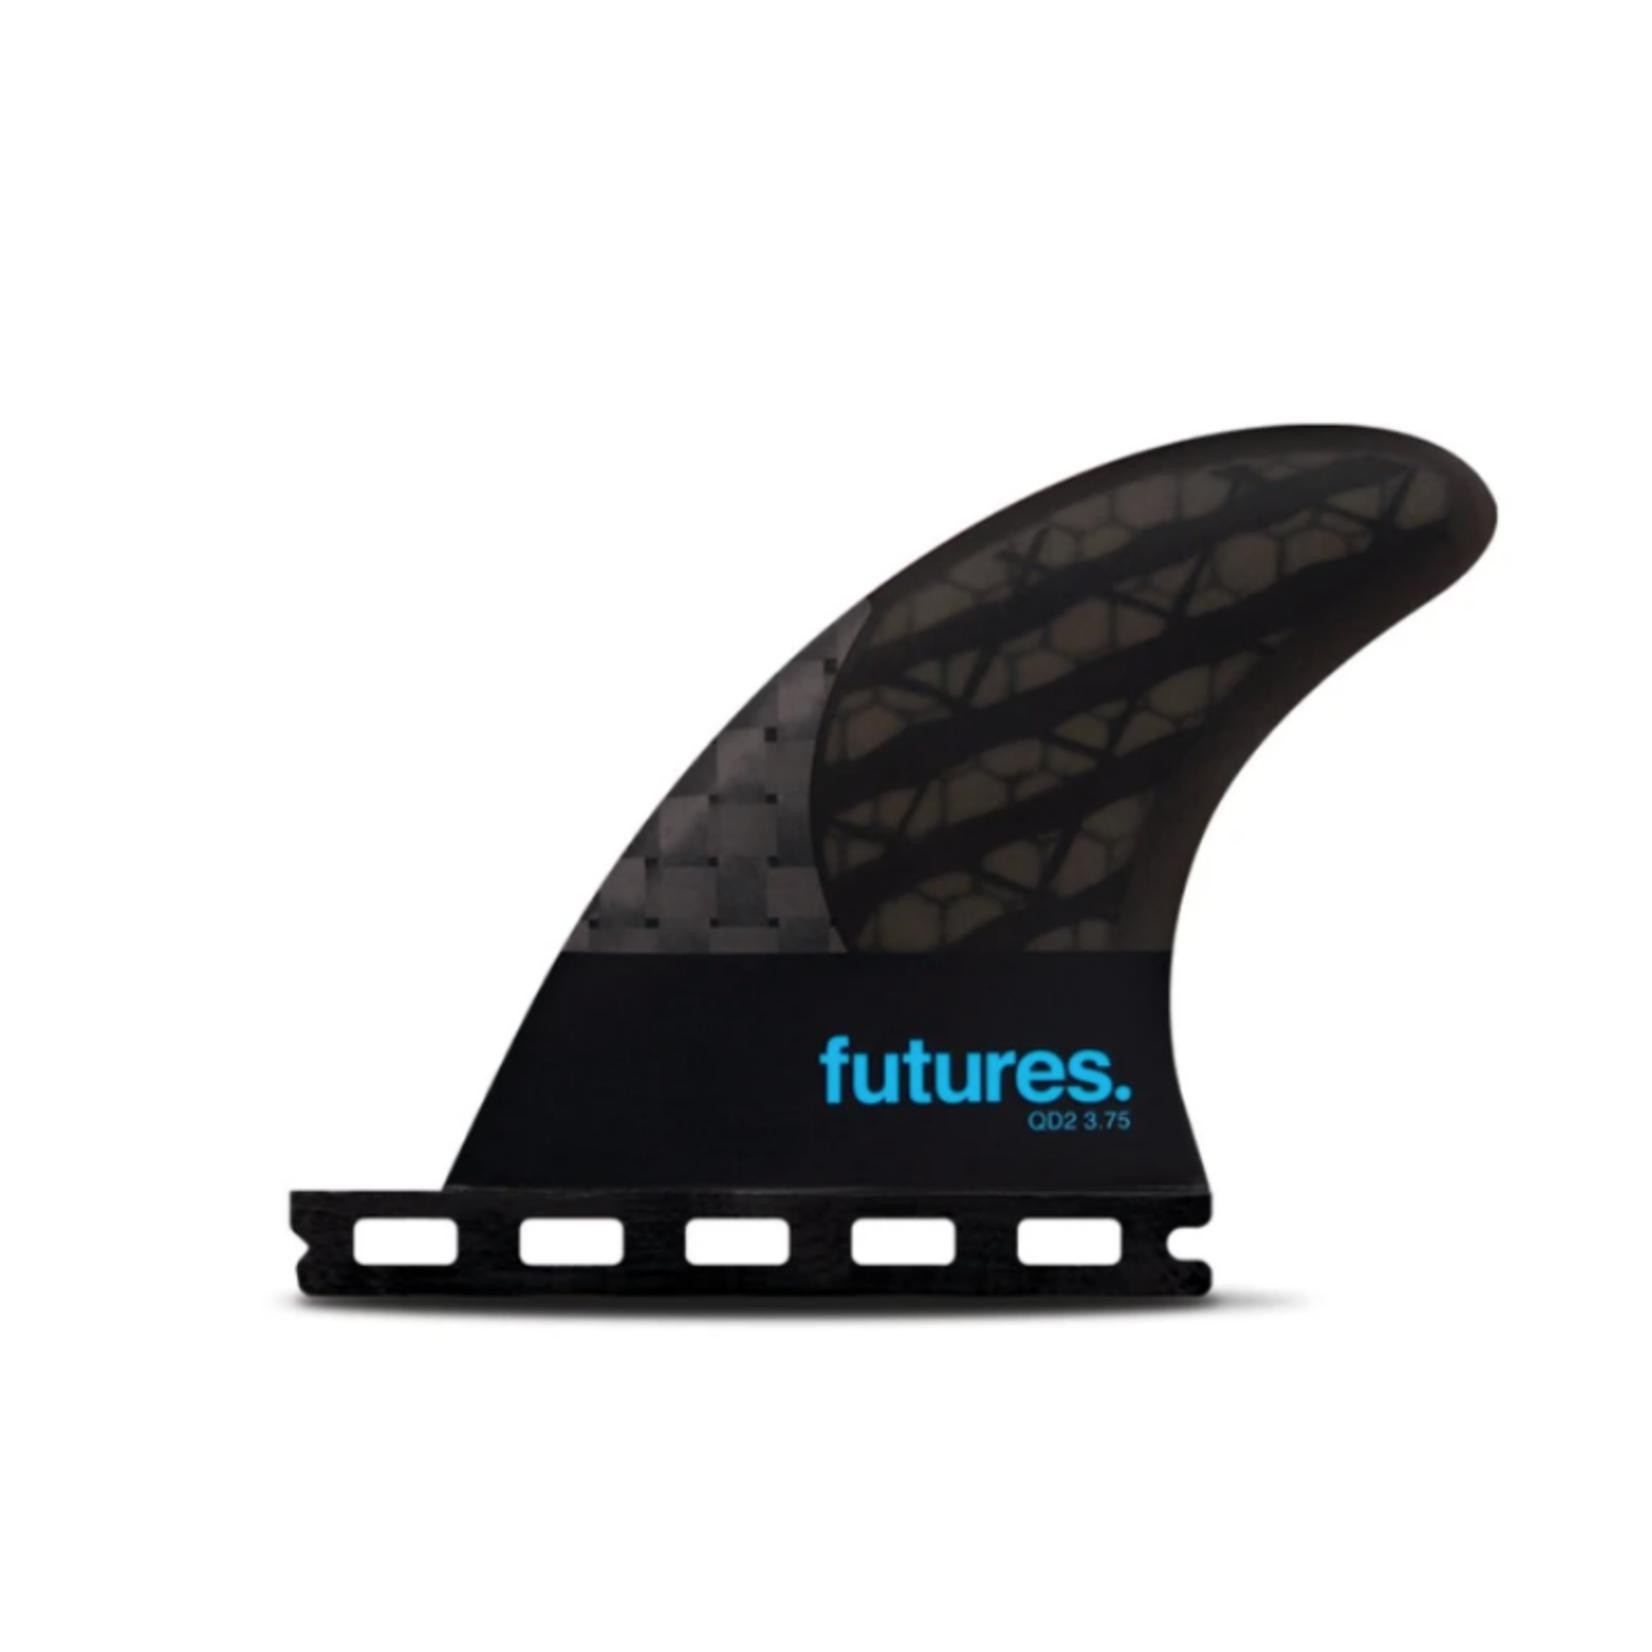 Futures. Futures Fins Quad Rear 3.75 Small Turquoise